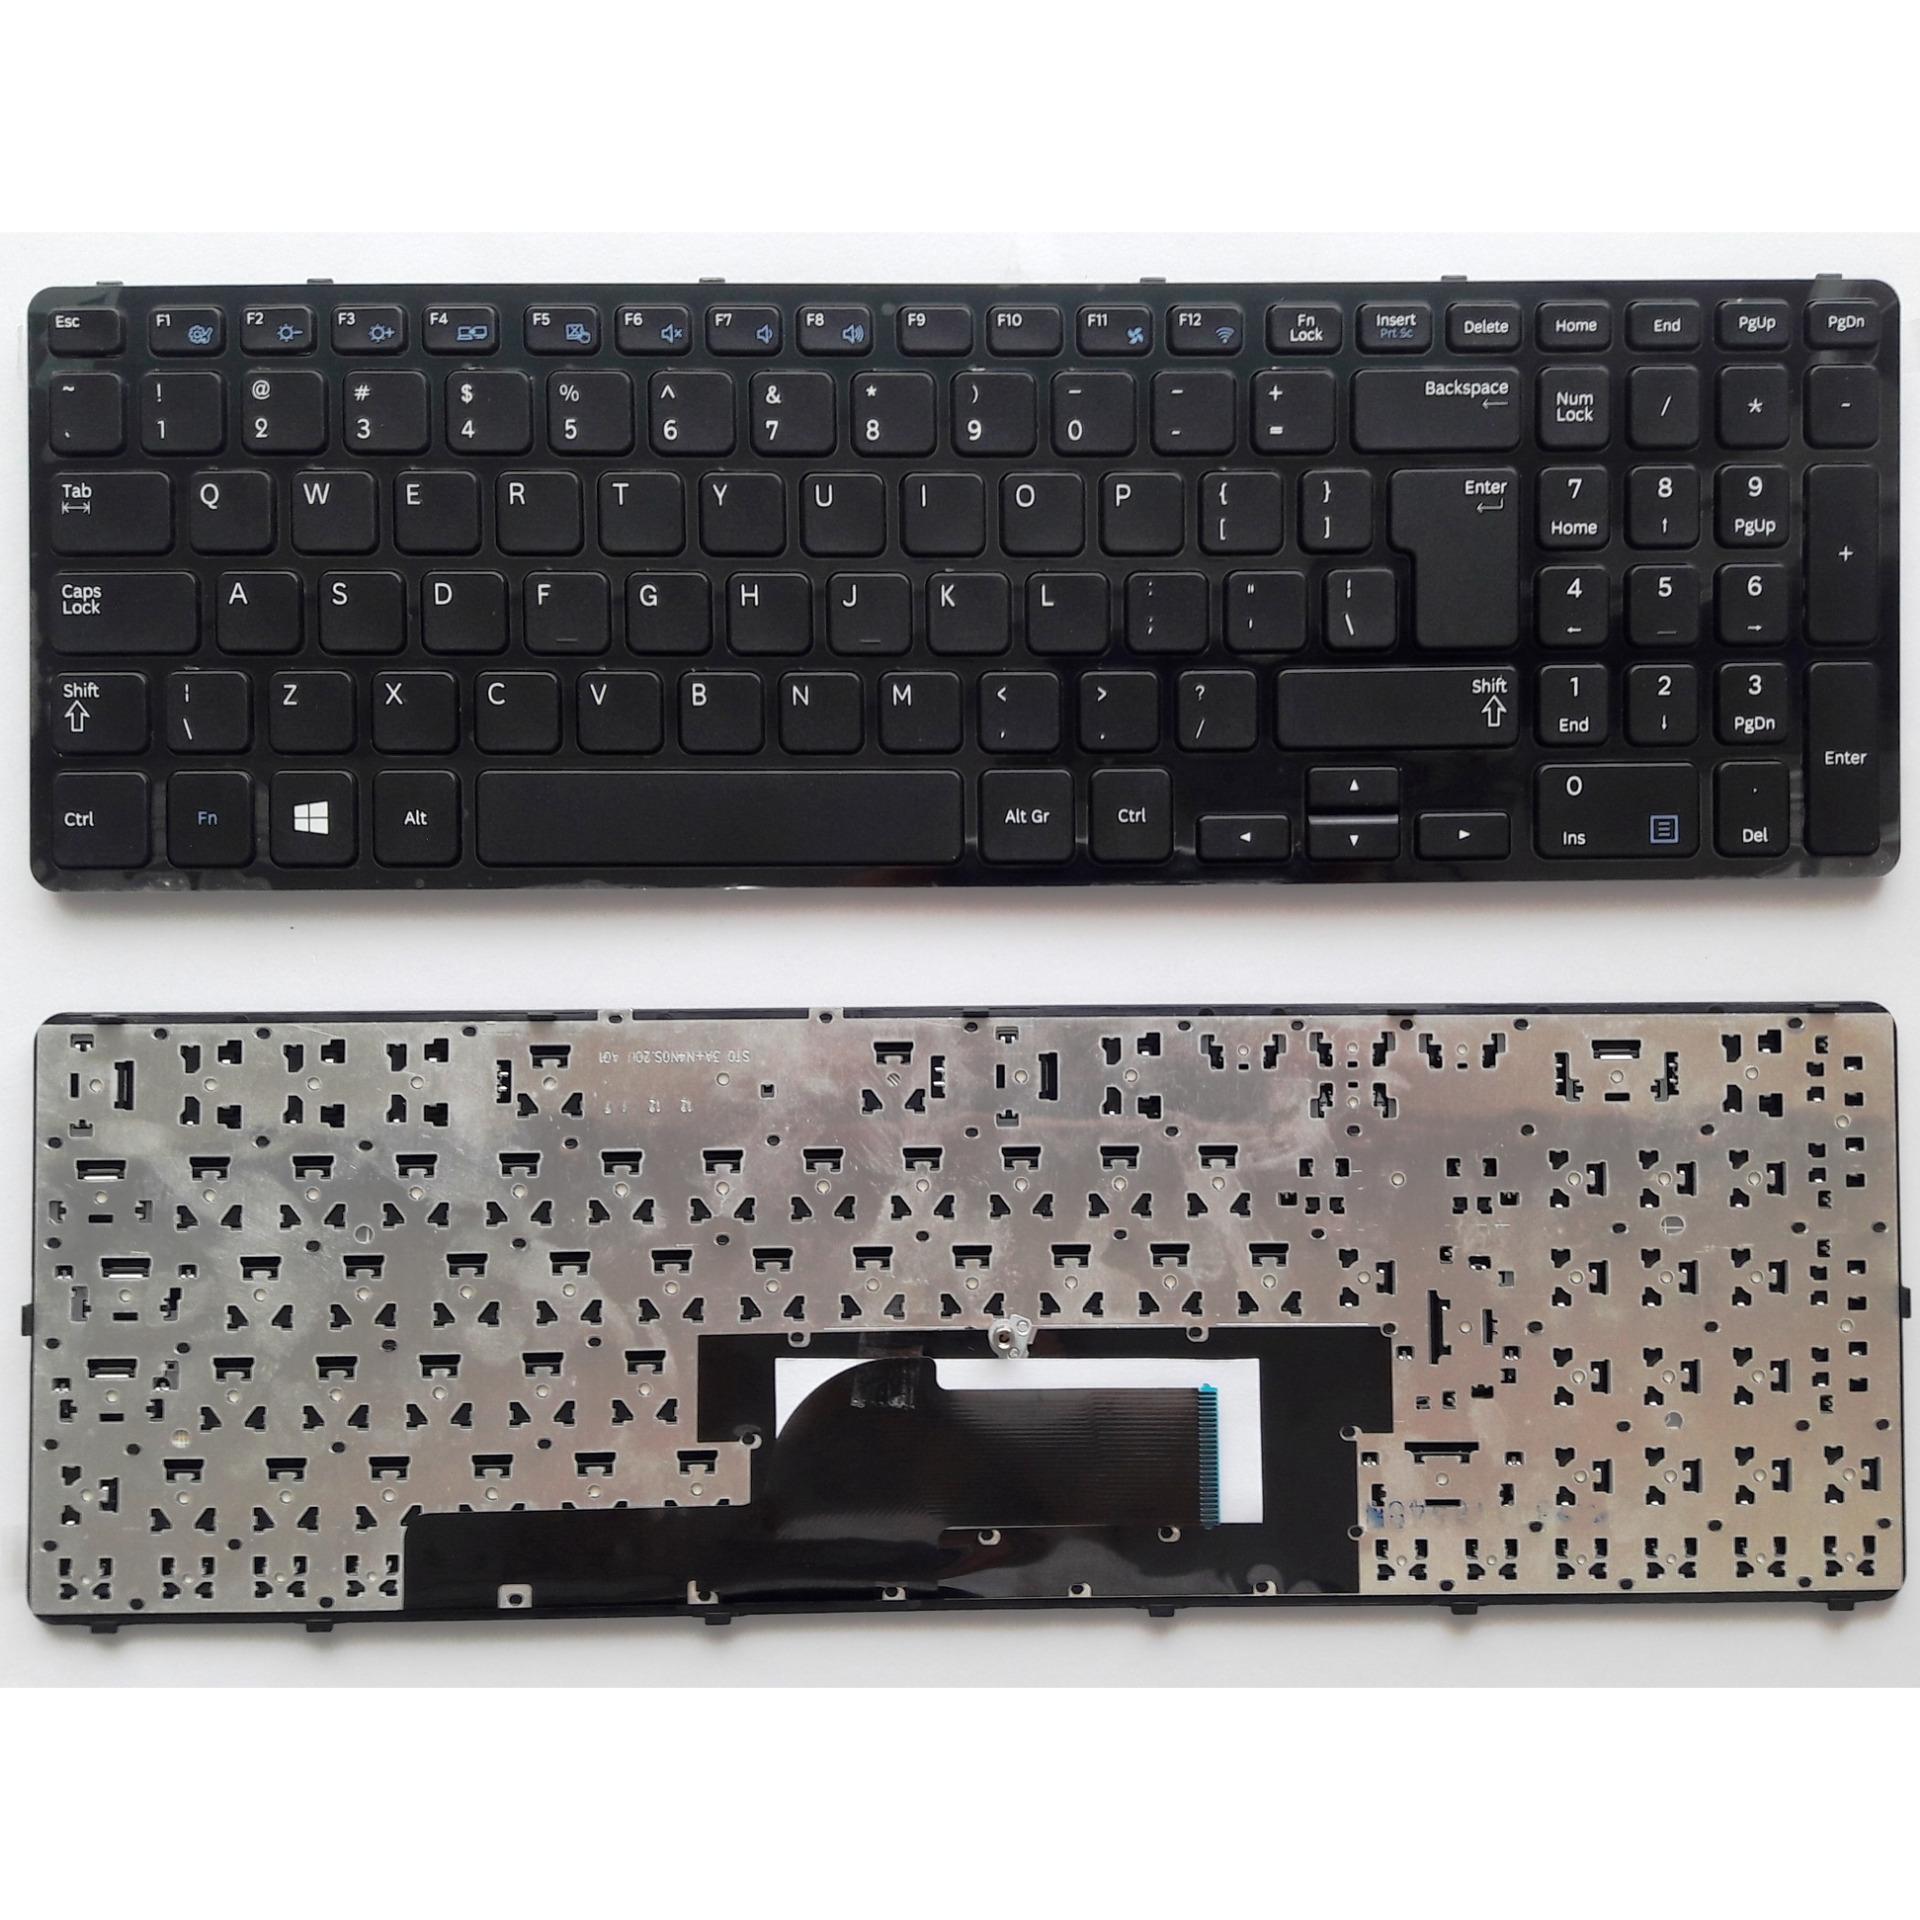 Harga Promo Universal Beberapa Kantong Wearable Kain Oxford Lembut Hp Laptop 14 Bw002ax Kondisi Baru Keyboard Samsung Np355e5c 365 Np350v5c Np355v5c